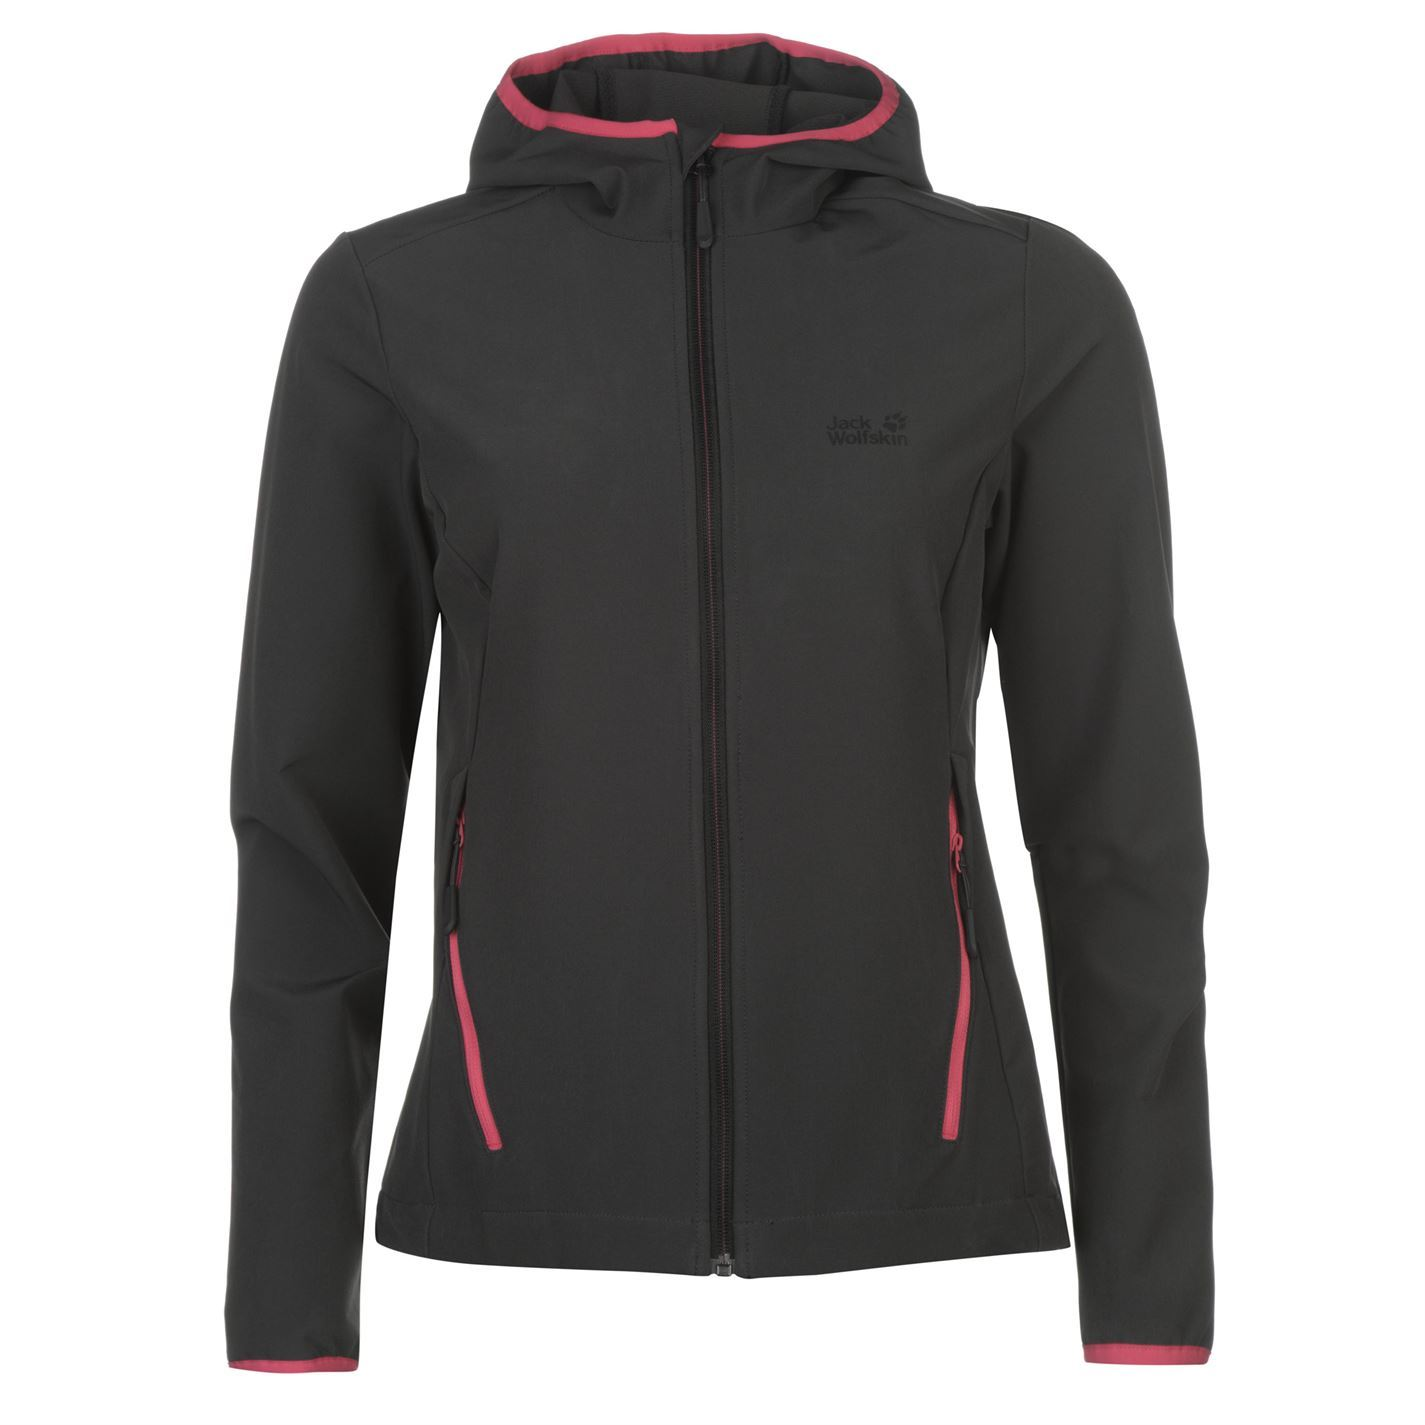 d7e705aec4a1 Jack Wolfskin Turbulence Soft Shell Jacket Ladies Softshell Coat Top ...